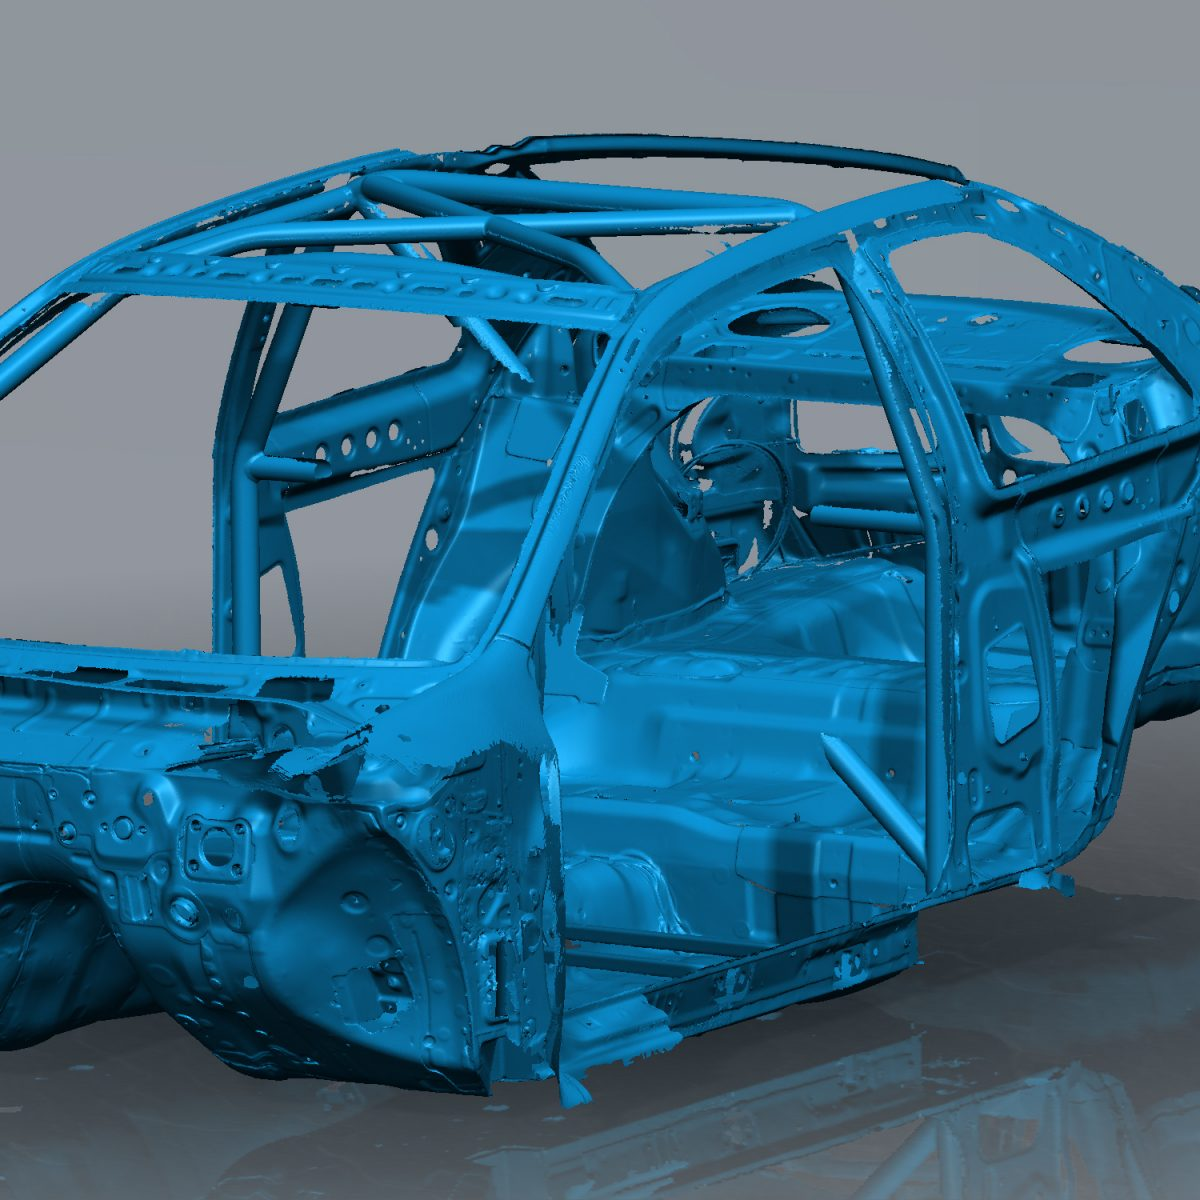 GC8 Subaru Front